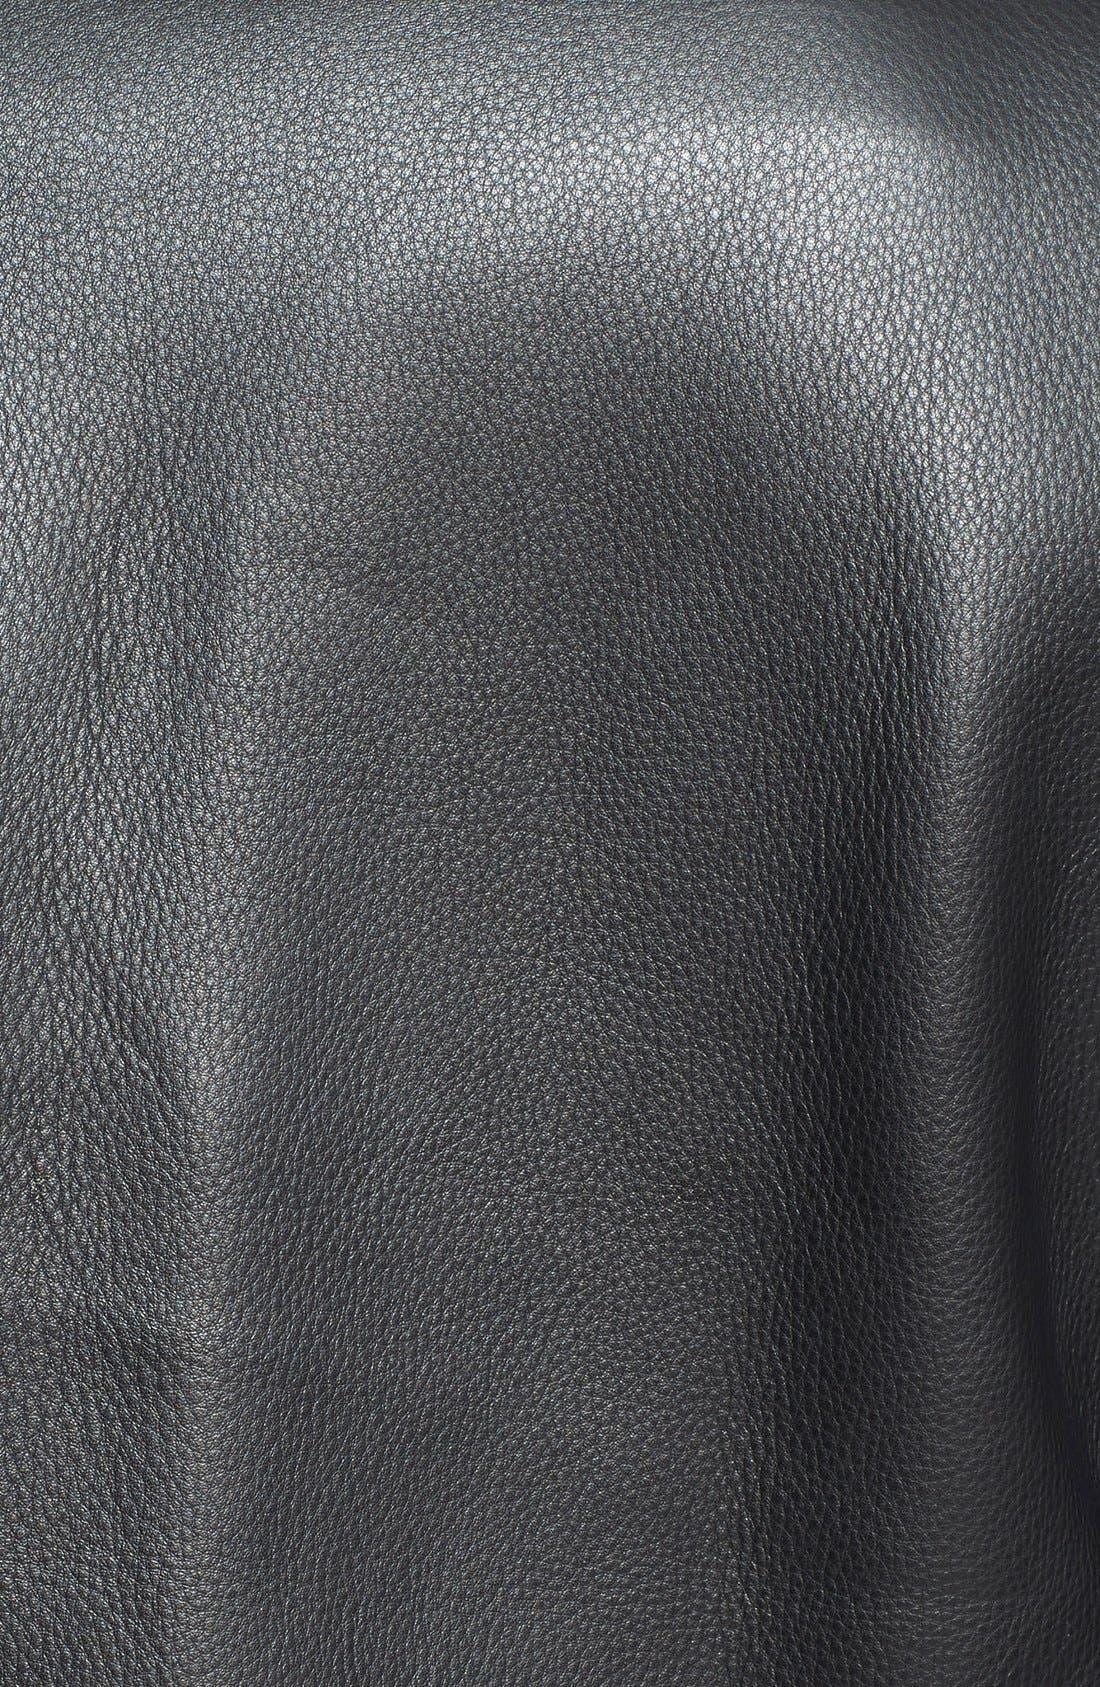 'Chips' Slim Fit Moto Leather Jacket,                             Alternate thumbnail 3, color,                             001